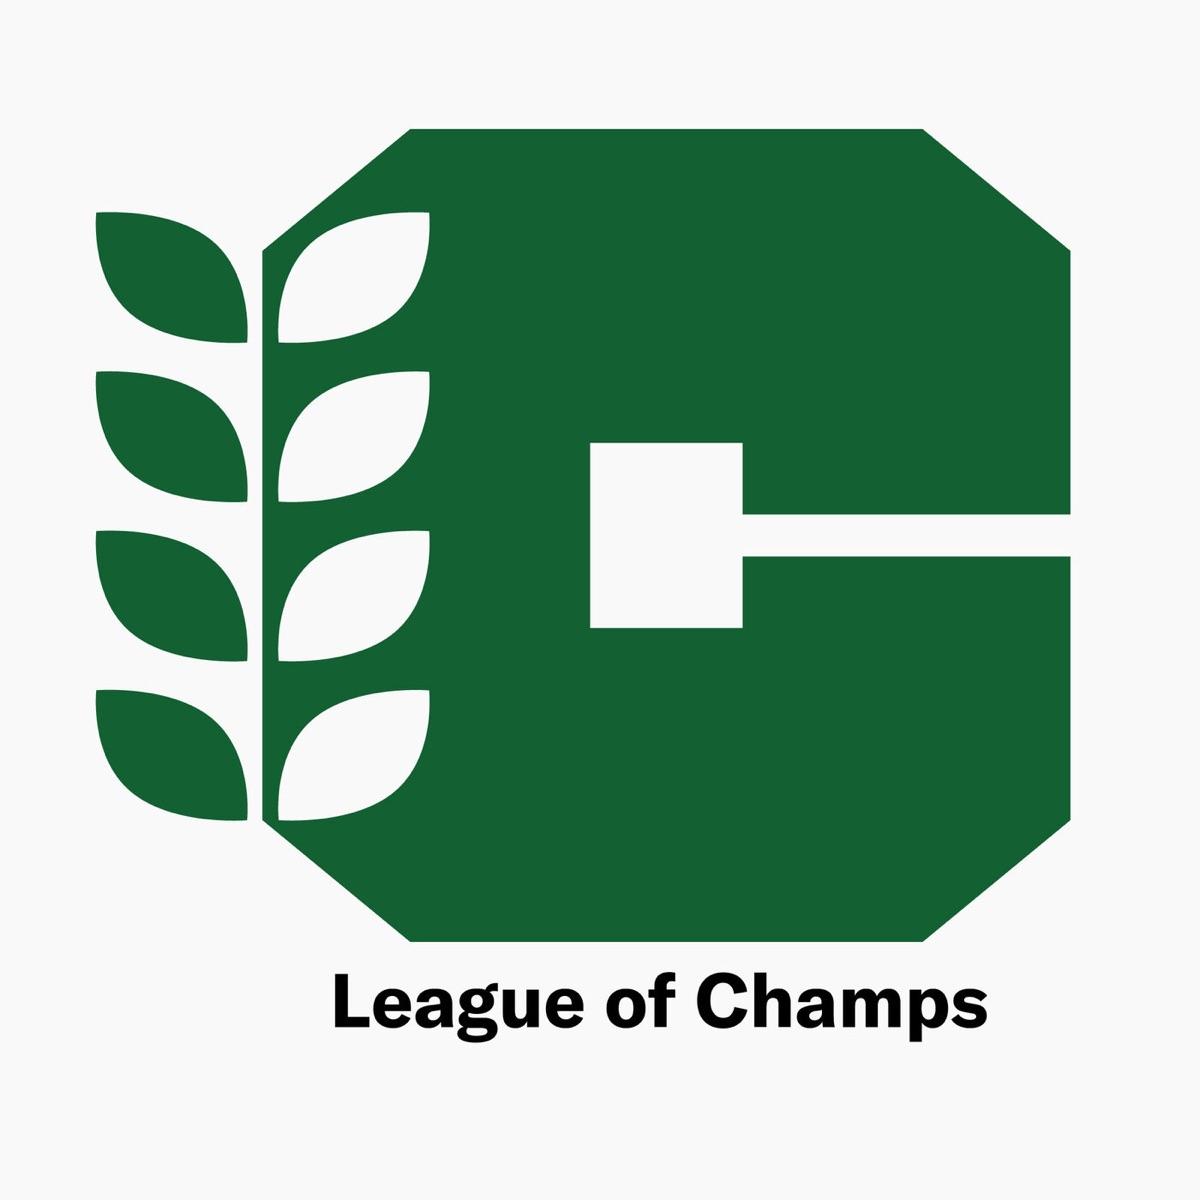 League of Champs